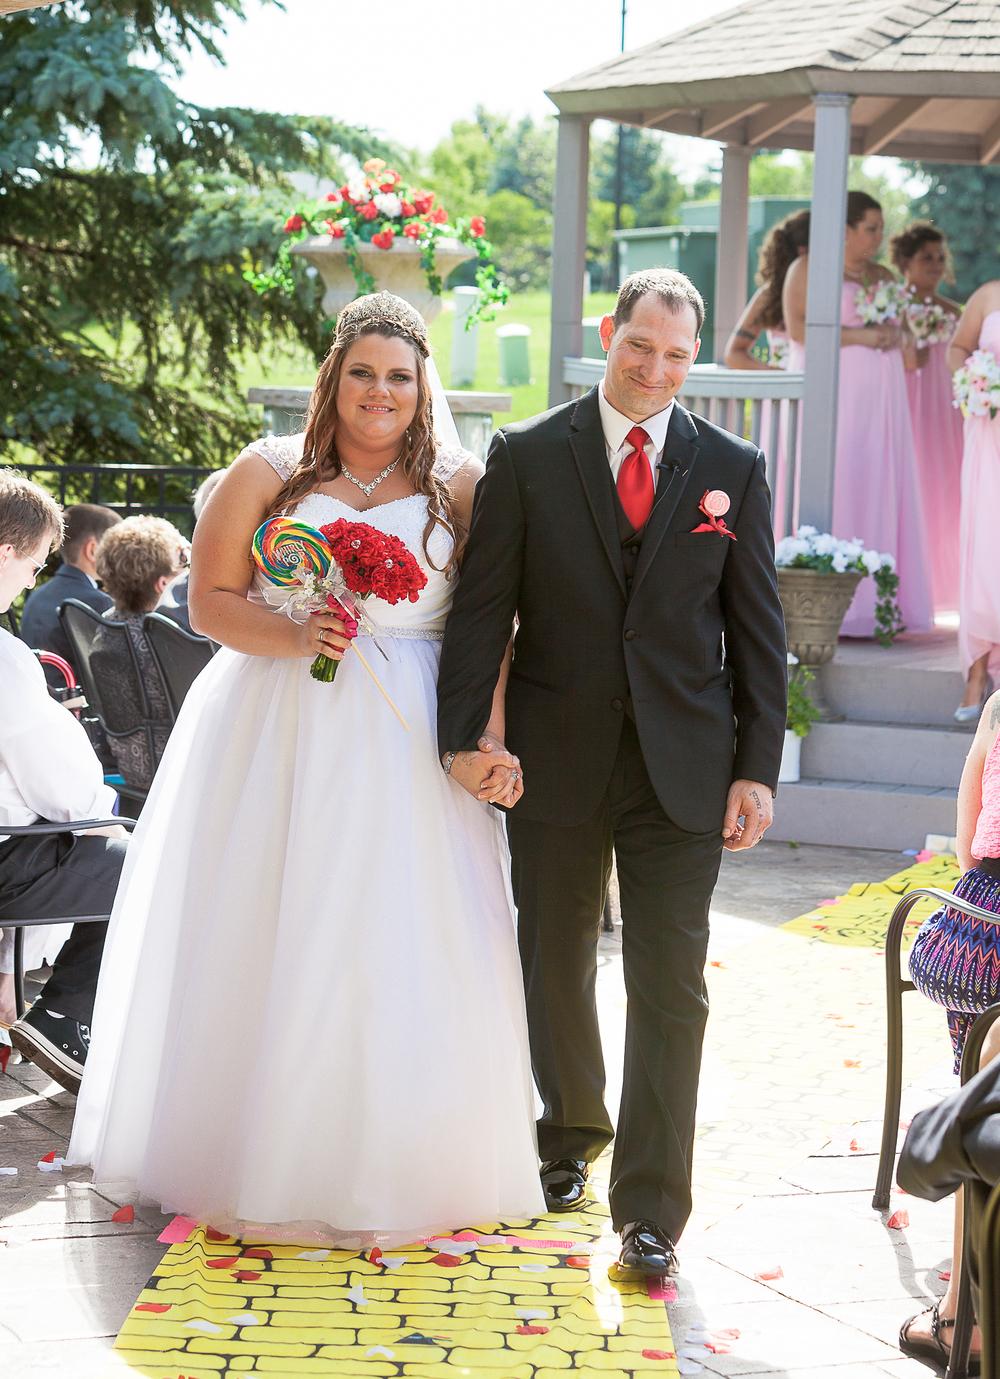 jenna + tony wedding blog (53 of 112).jpg